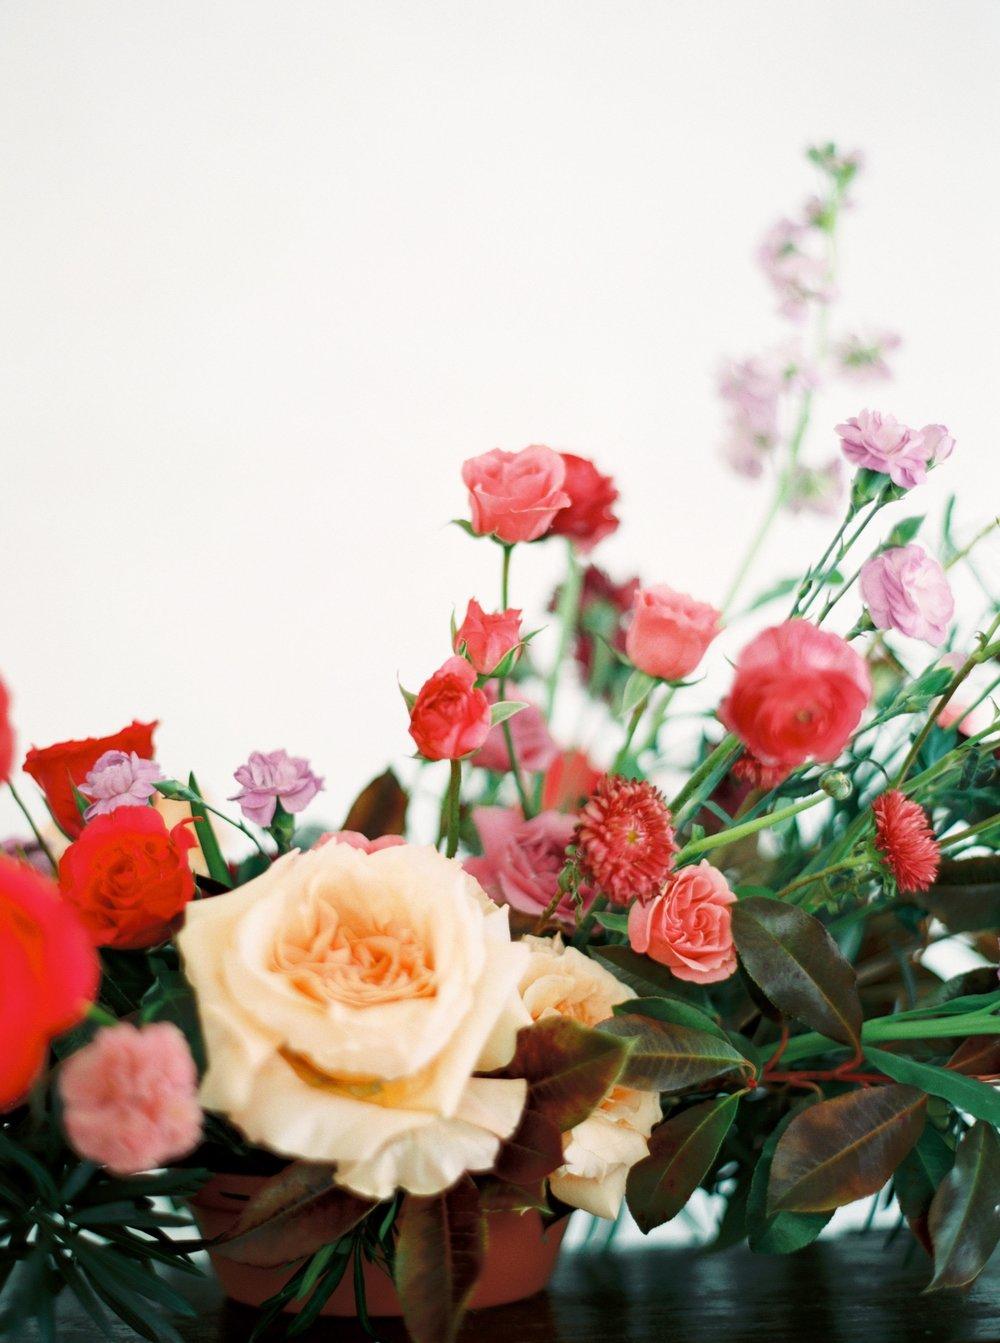 Owensboro Evansville Henderson Newburgh Wedding Flowers Florist00044.jpg